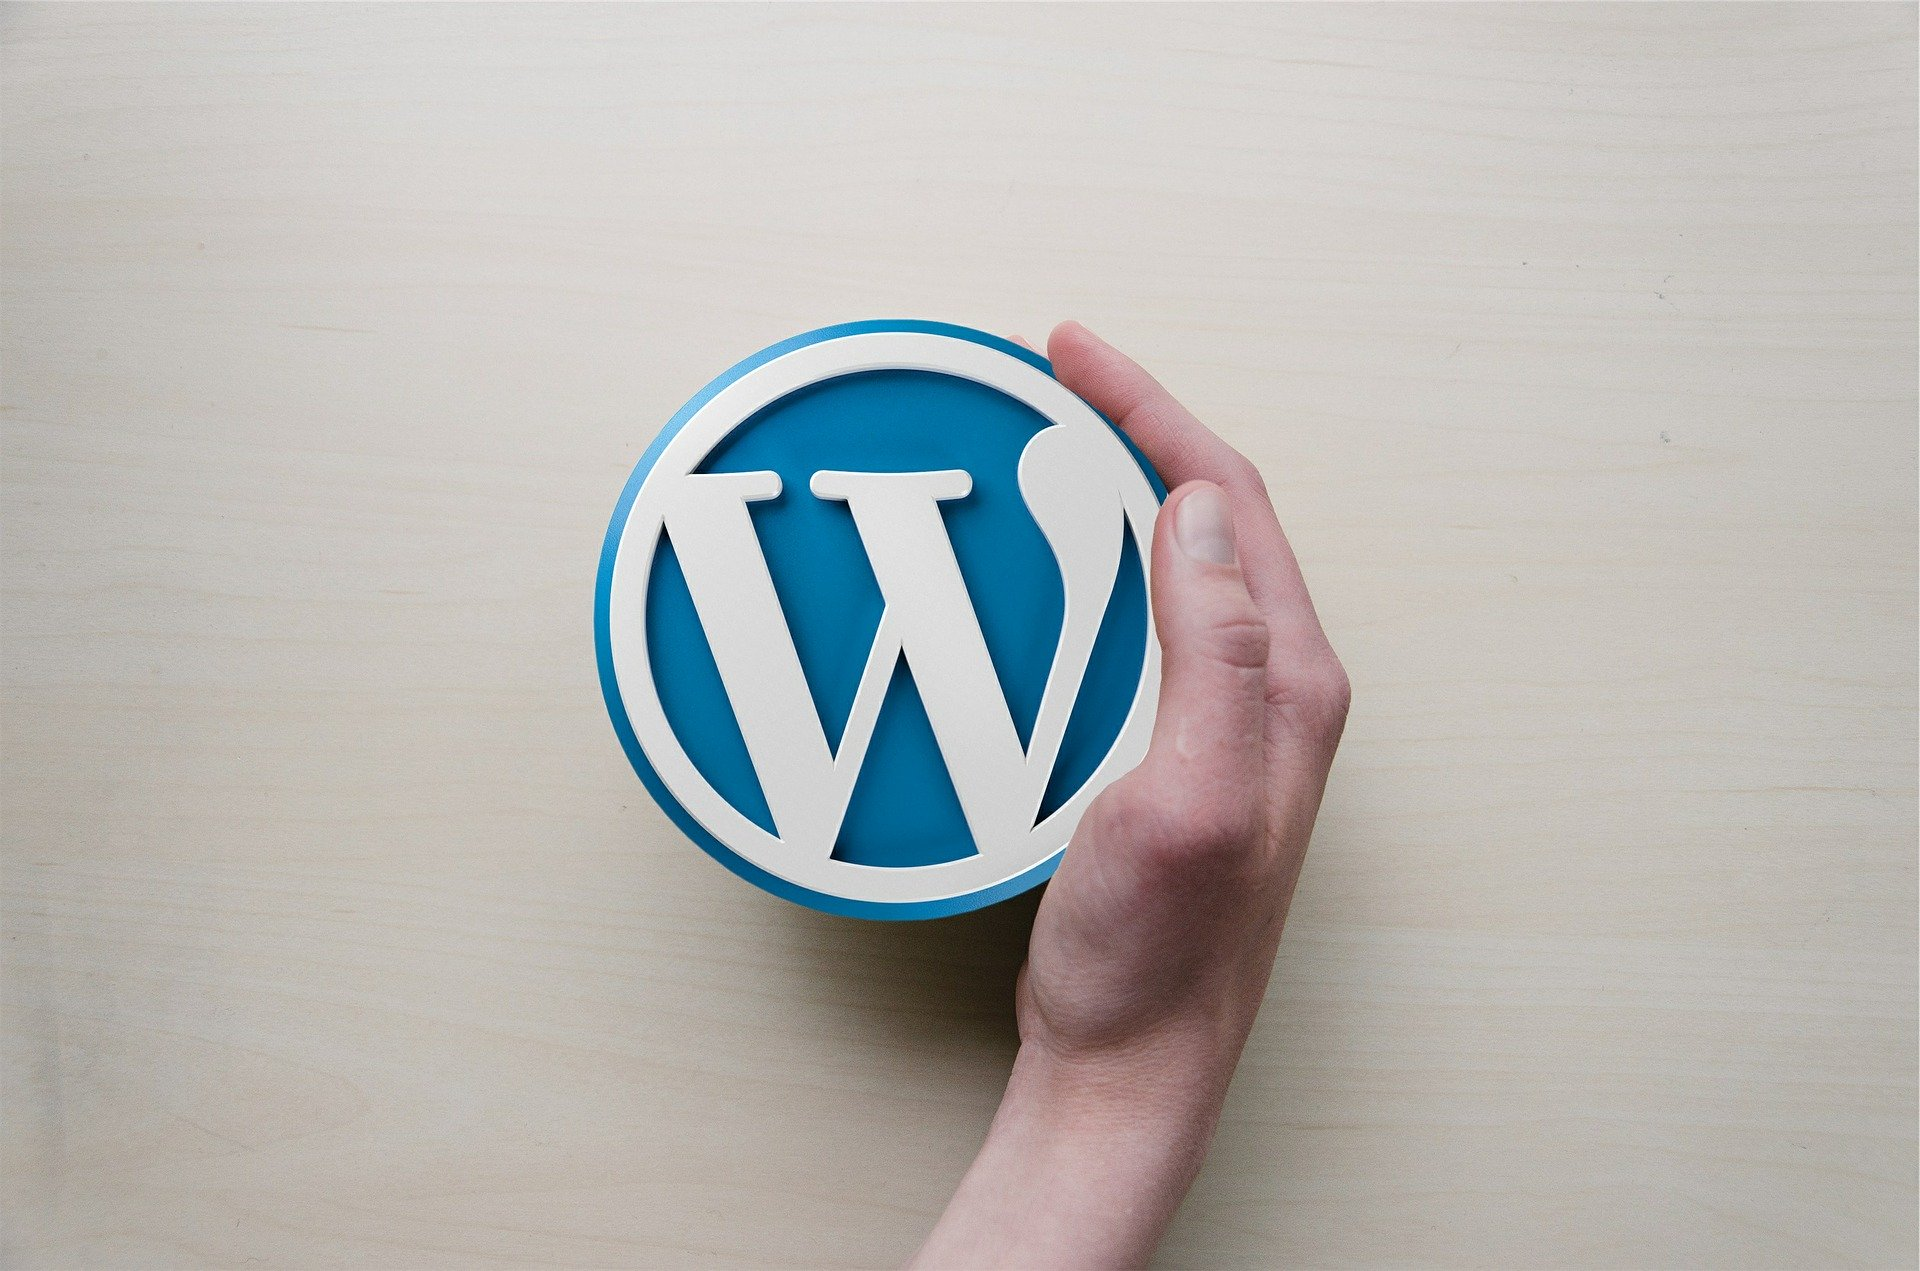 WordPressでの運営とWeb制作